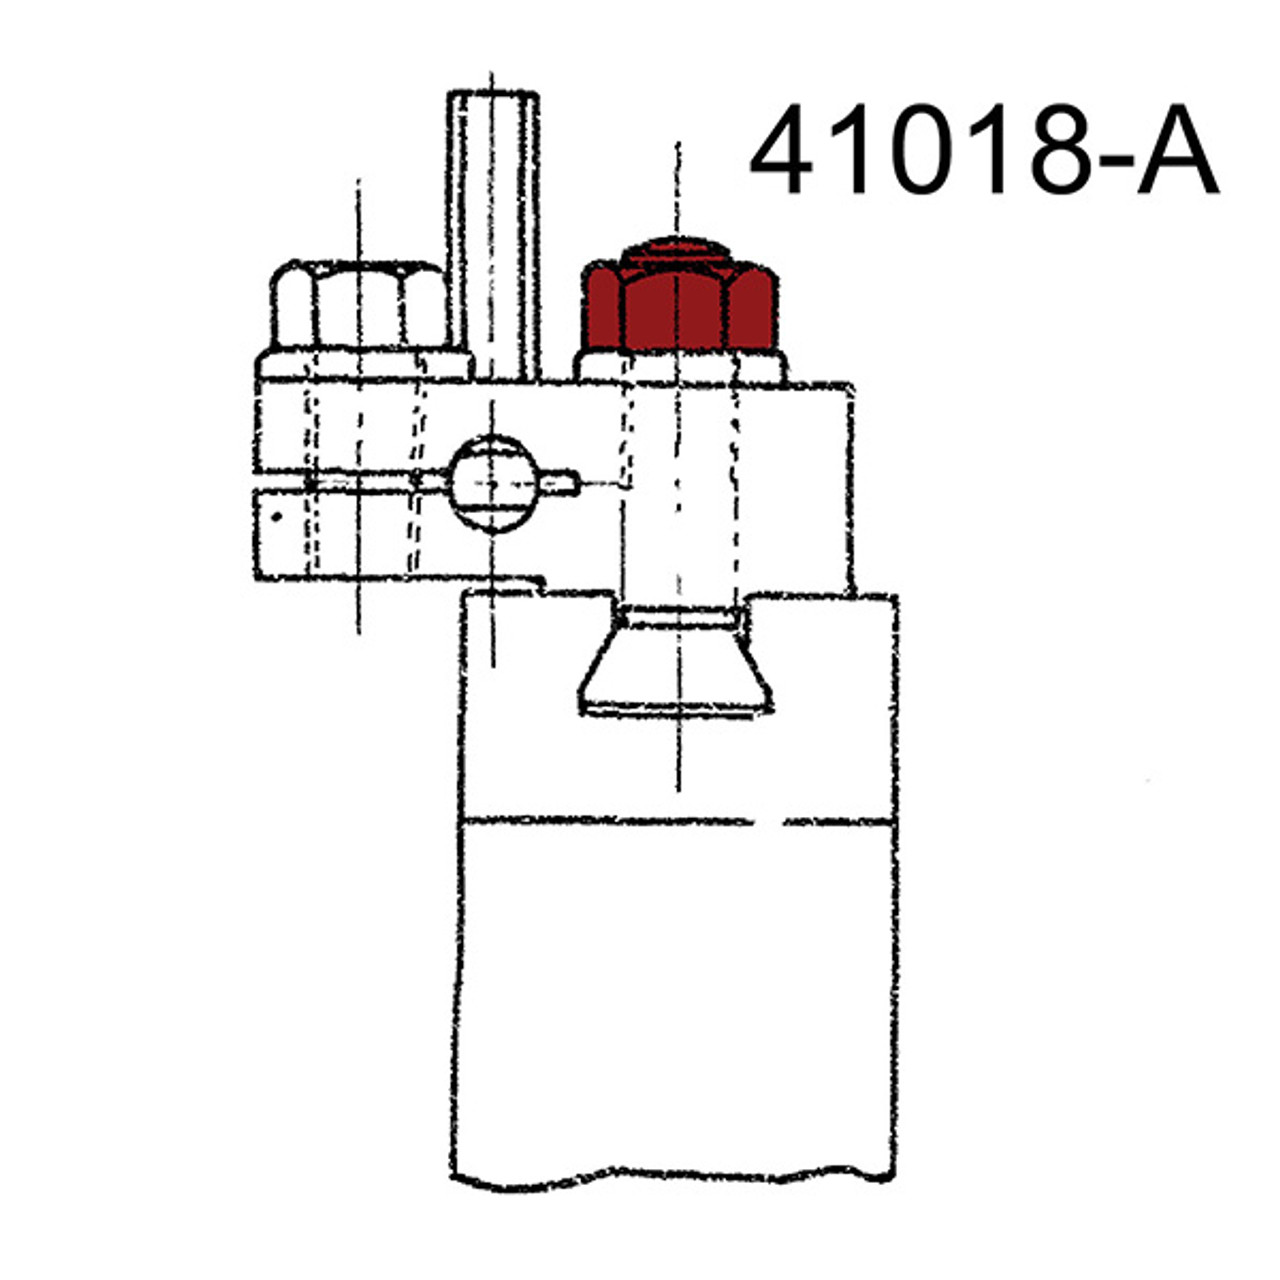 Nut HV Hex  .625-11  .60 (41018)